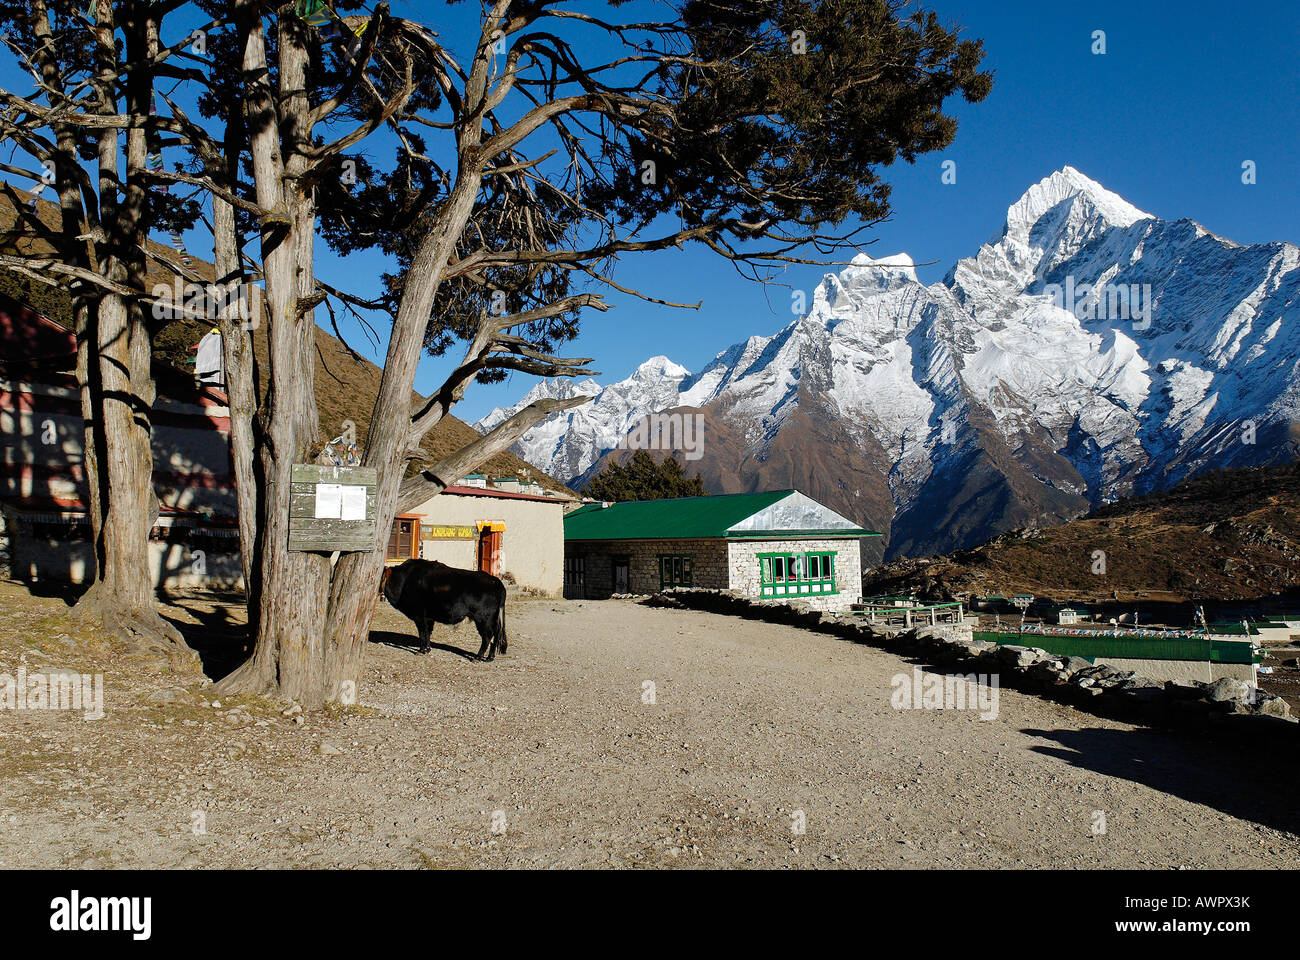 Sherpa village Khumjung with Thamserku (6608), Sagarmatha National Park, Khumbu, Nepal - Stock Image